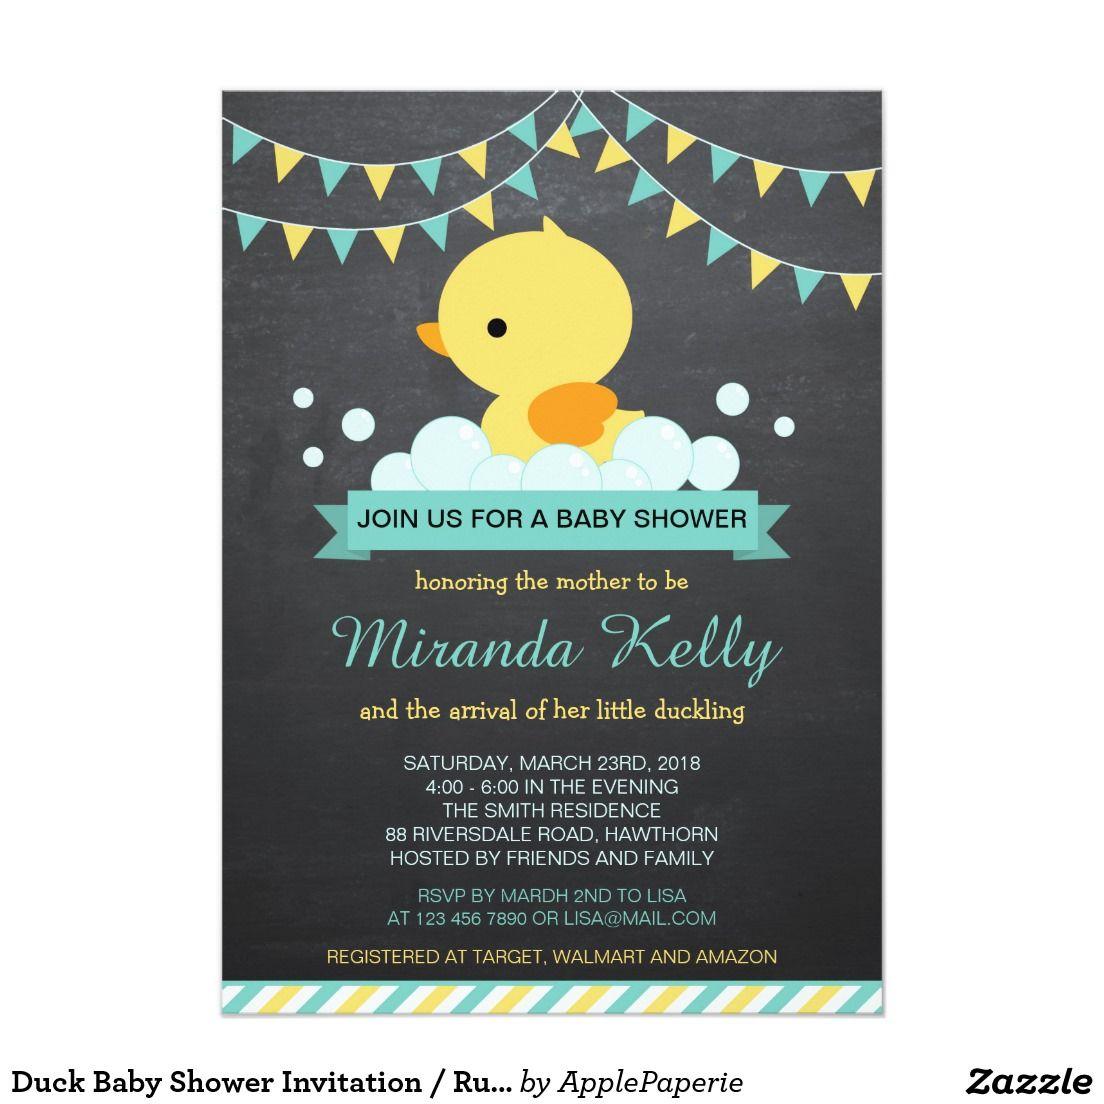 Duck Baby Shower Invitation / Rubber Duck Invite | Duck baby showers ...